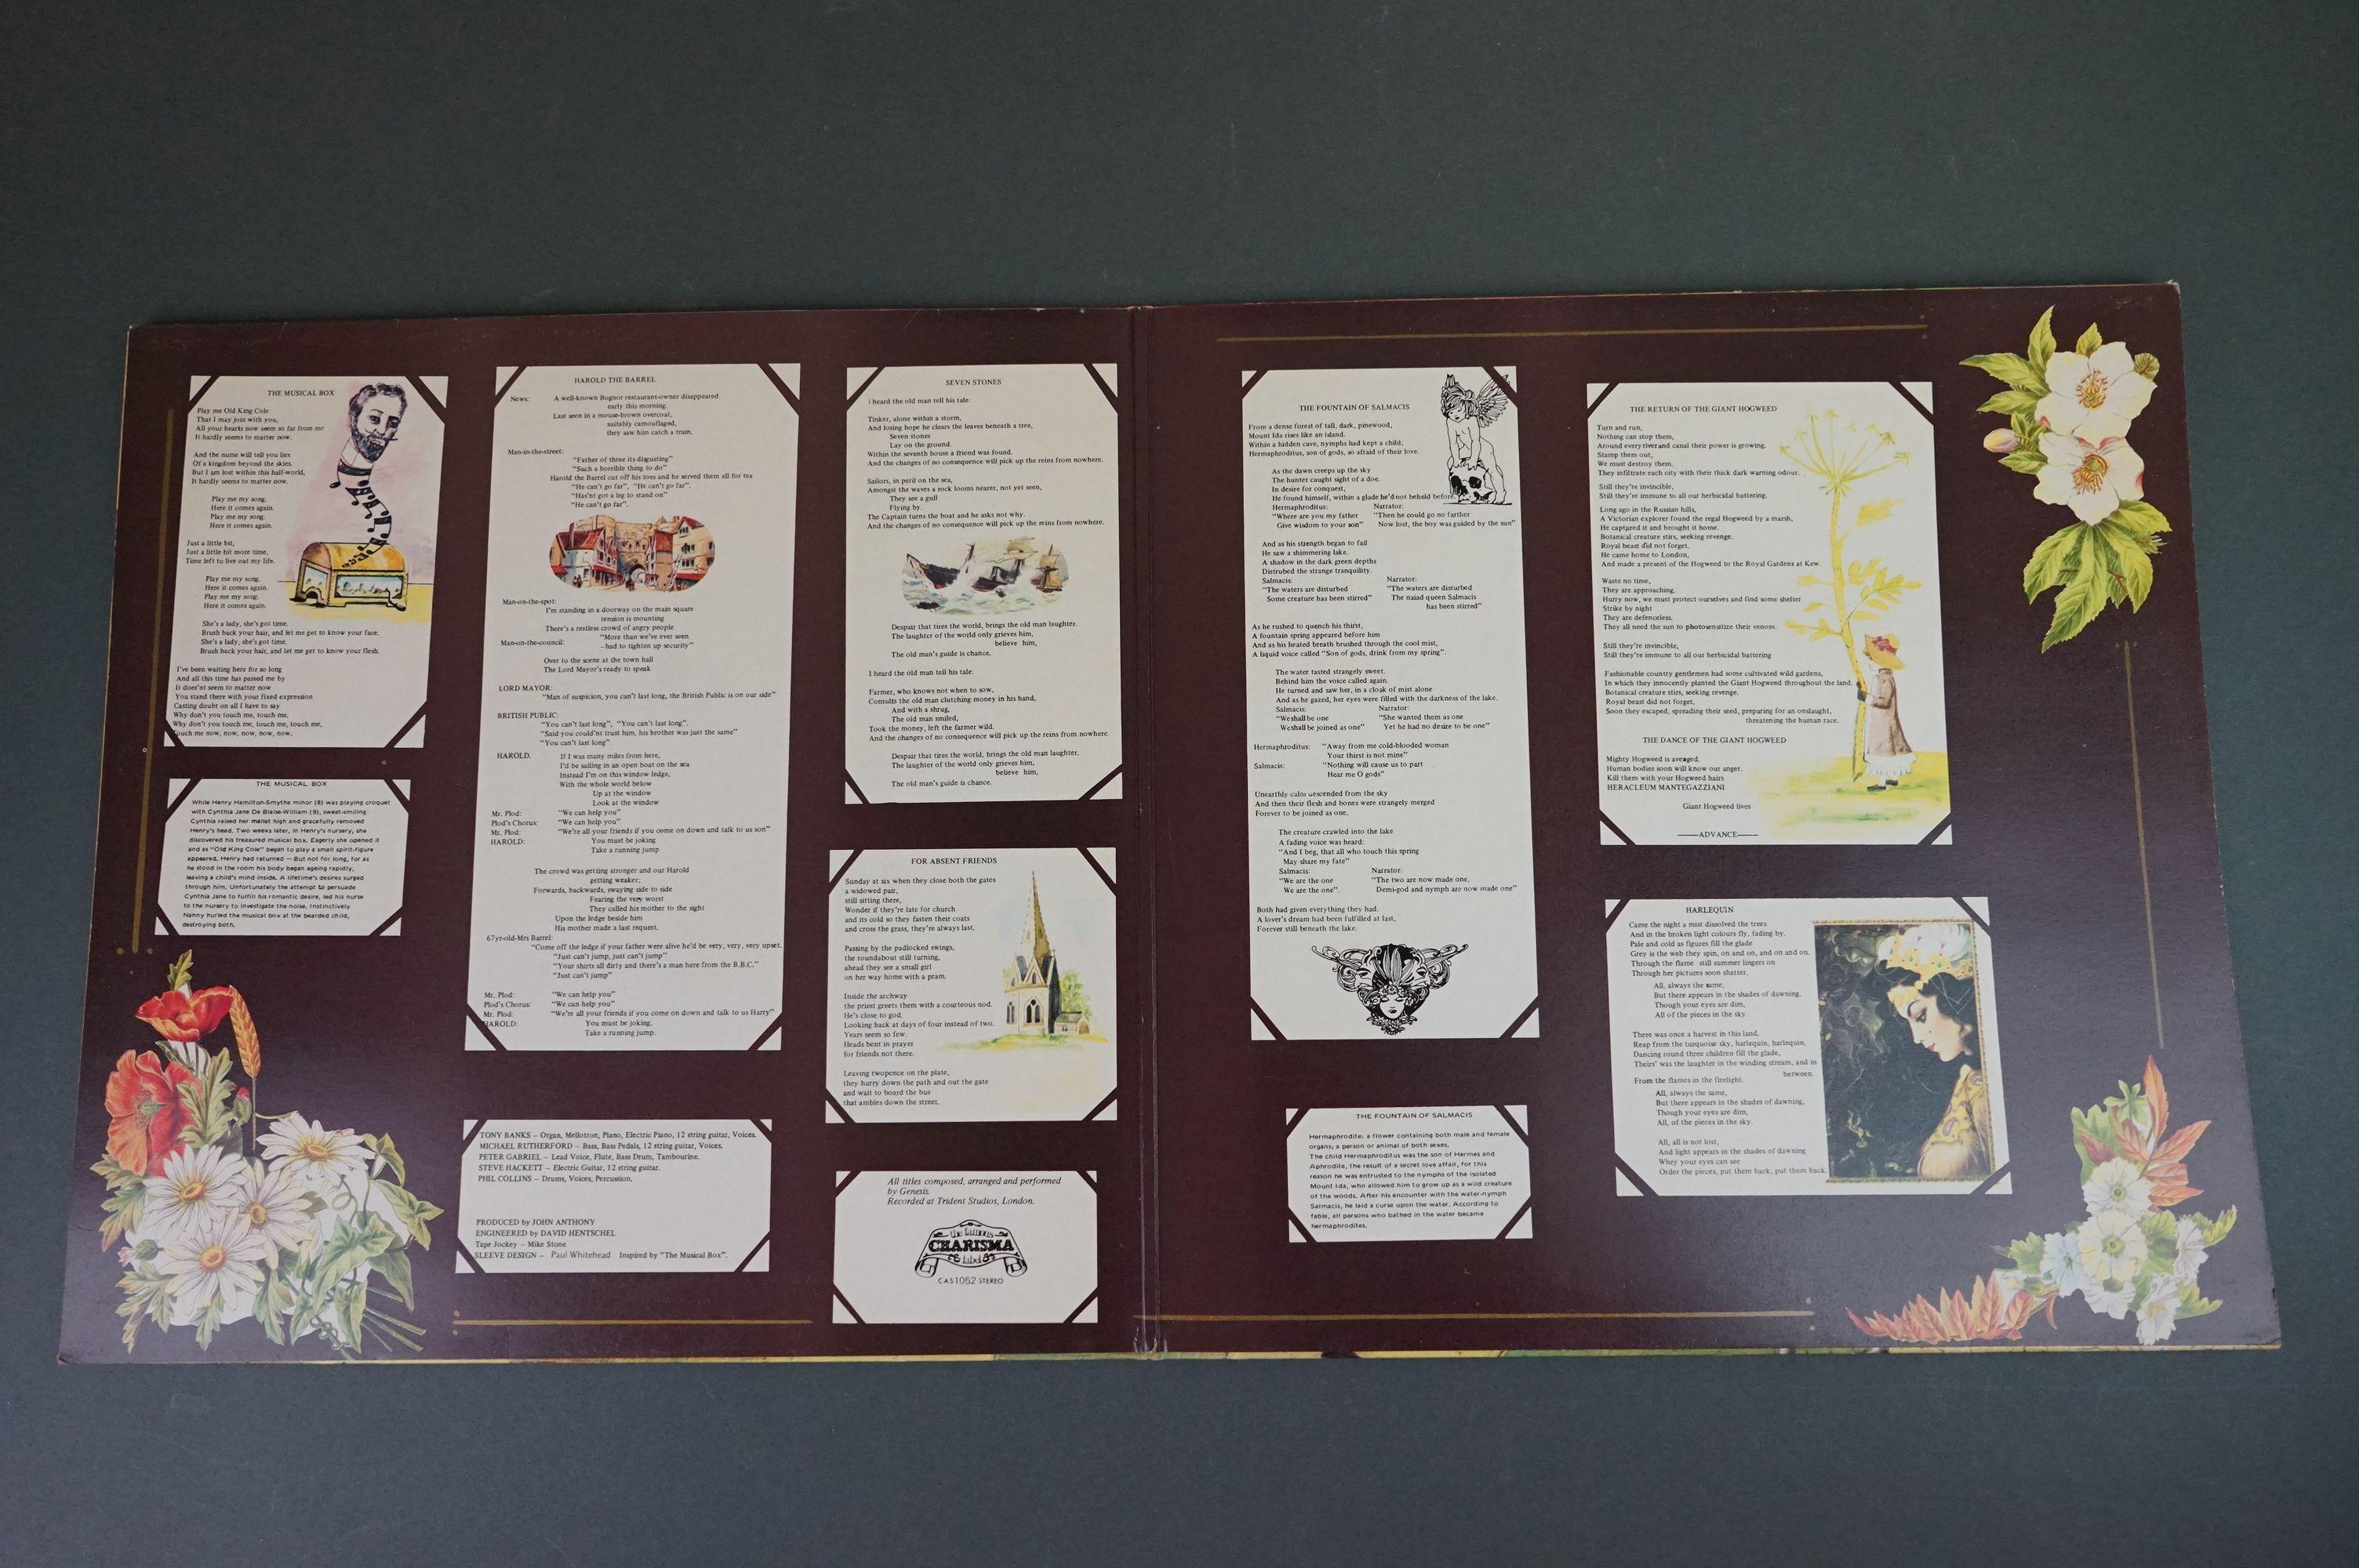 Vinyl - Five Genesis LPs to include Trespass (CAS1020), Nursery Cryme (CAS1052), Foxtrot ( - Image 5 of 9